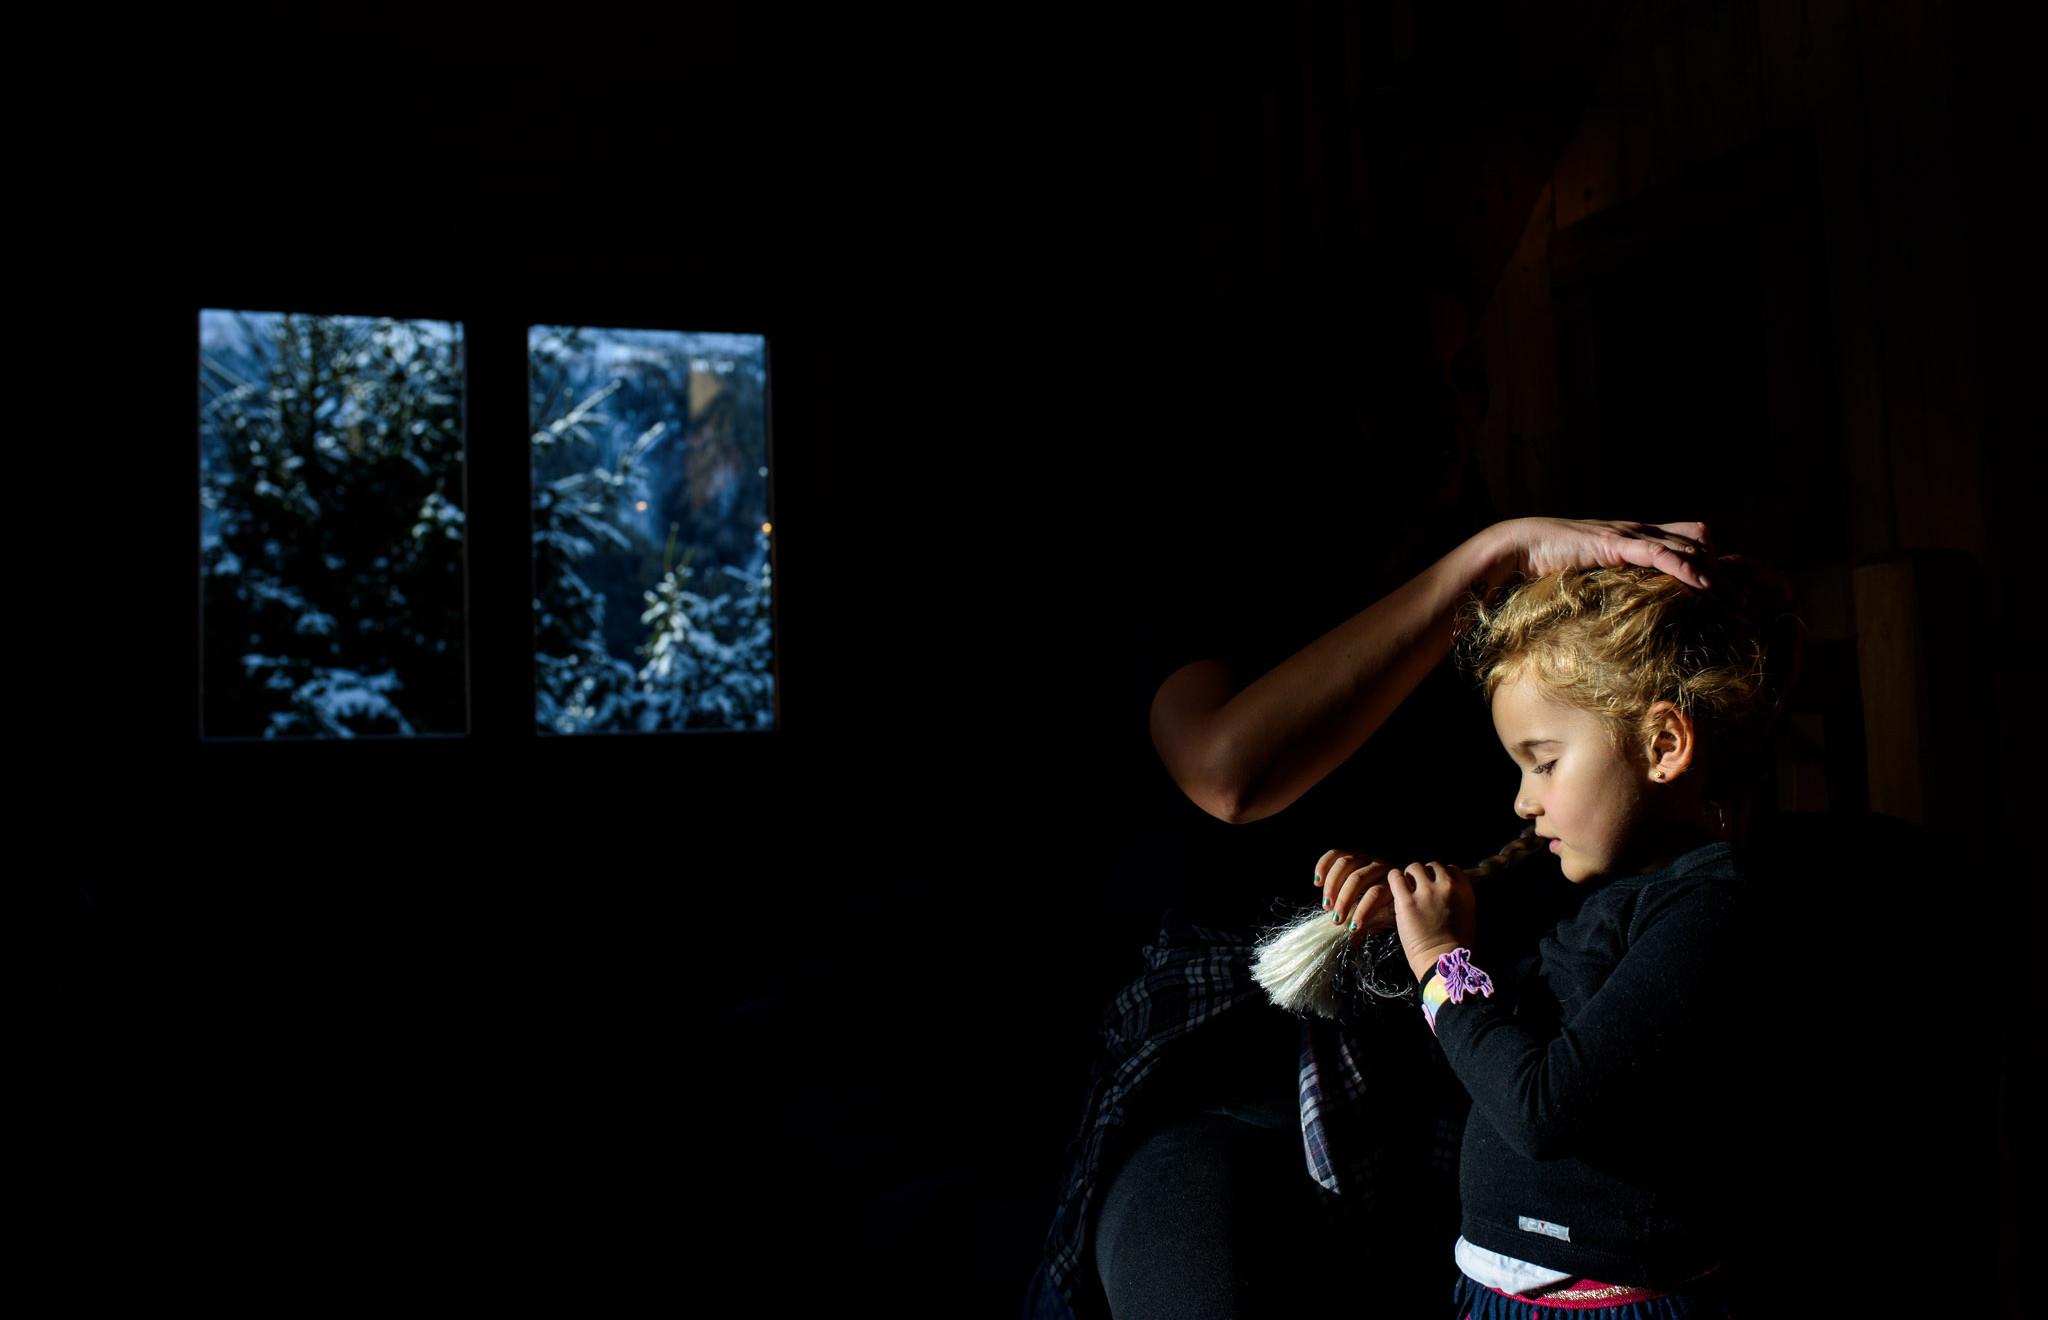 little girl gets an Elsa braid in a cabin